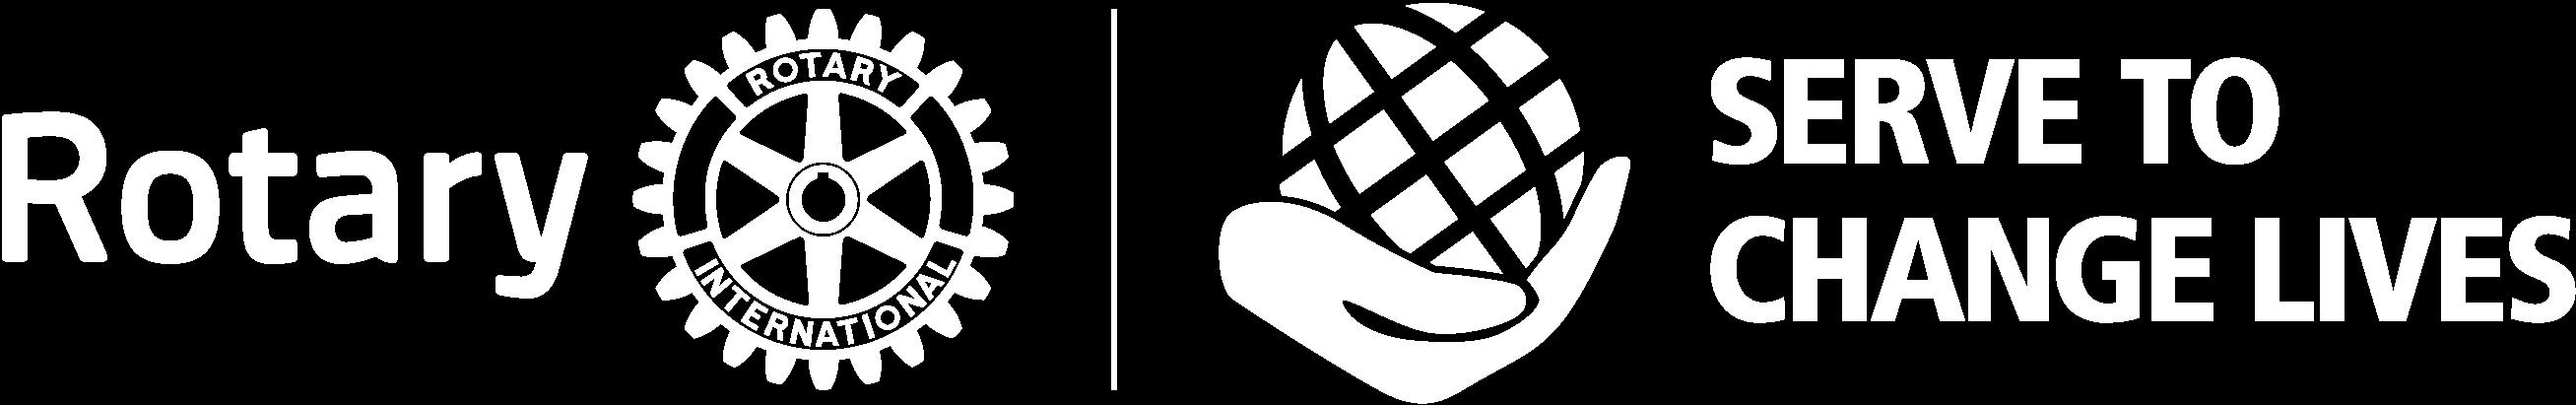 Rotary International Theme with Masterbrand - White